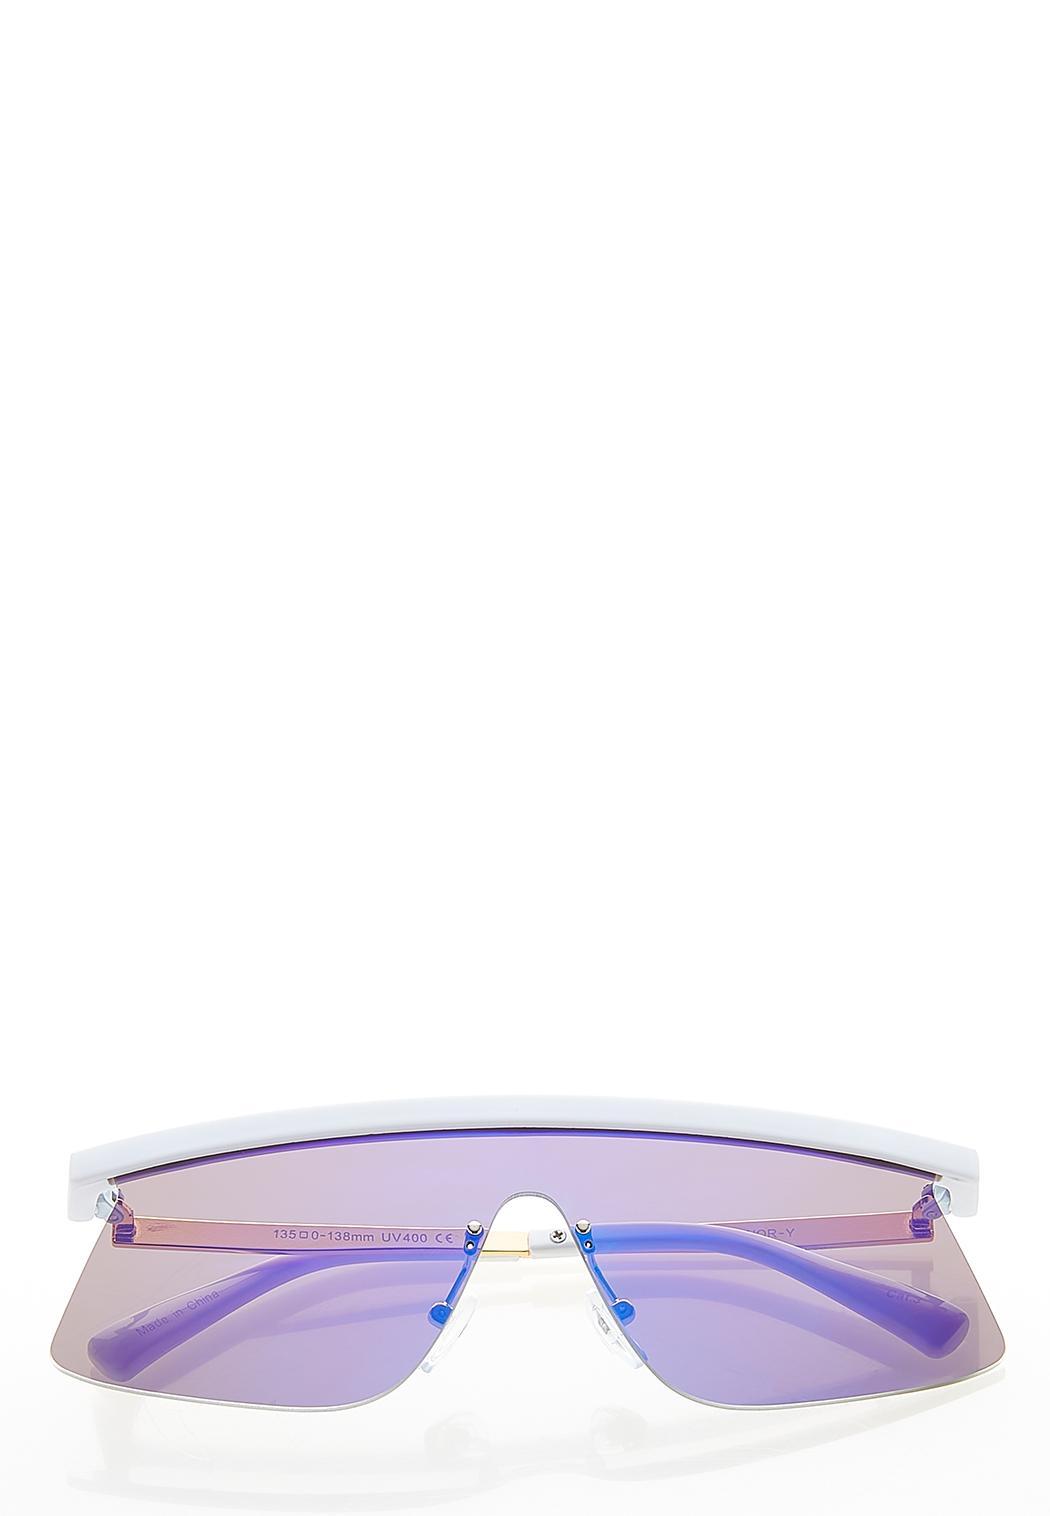 Fashion Shield Sunglasses